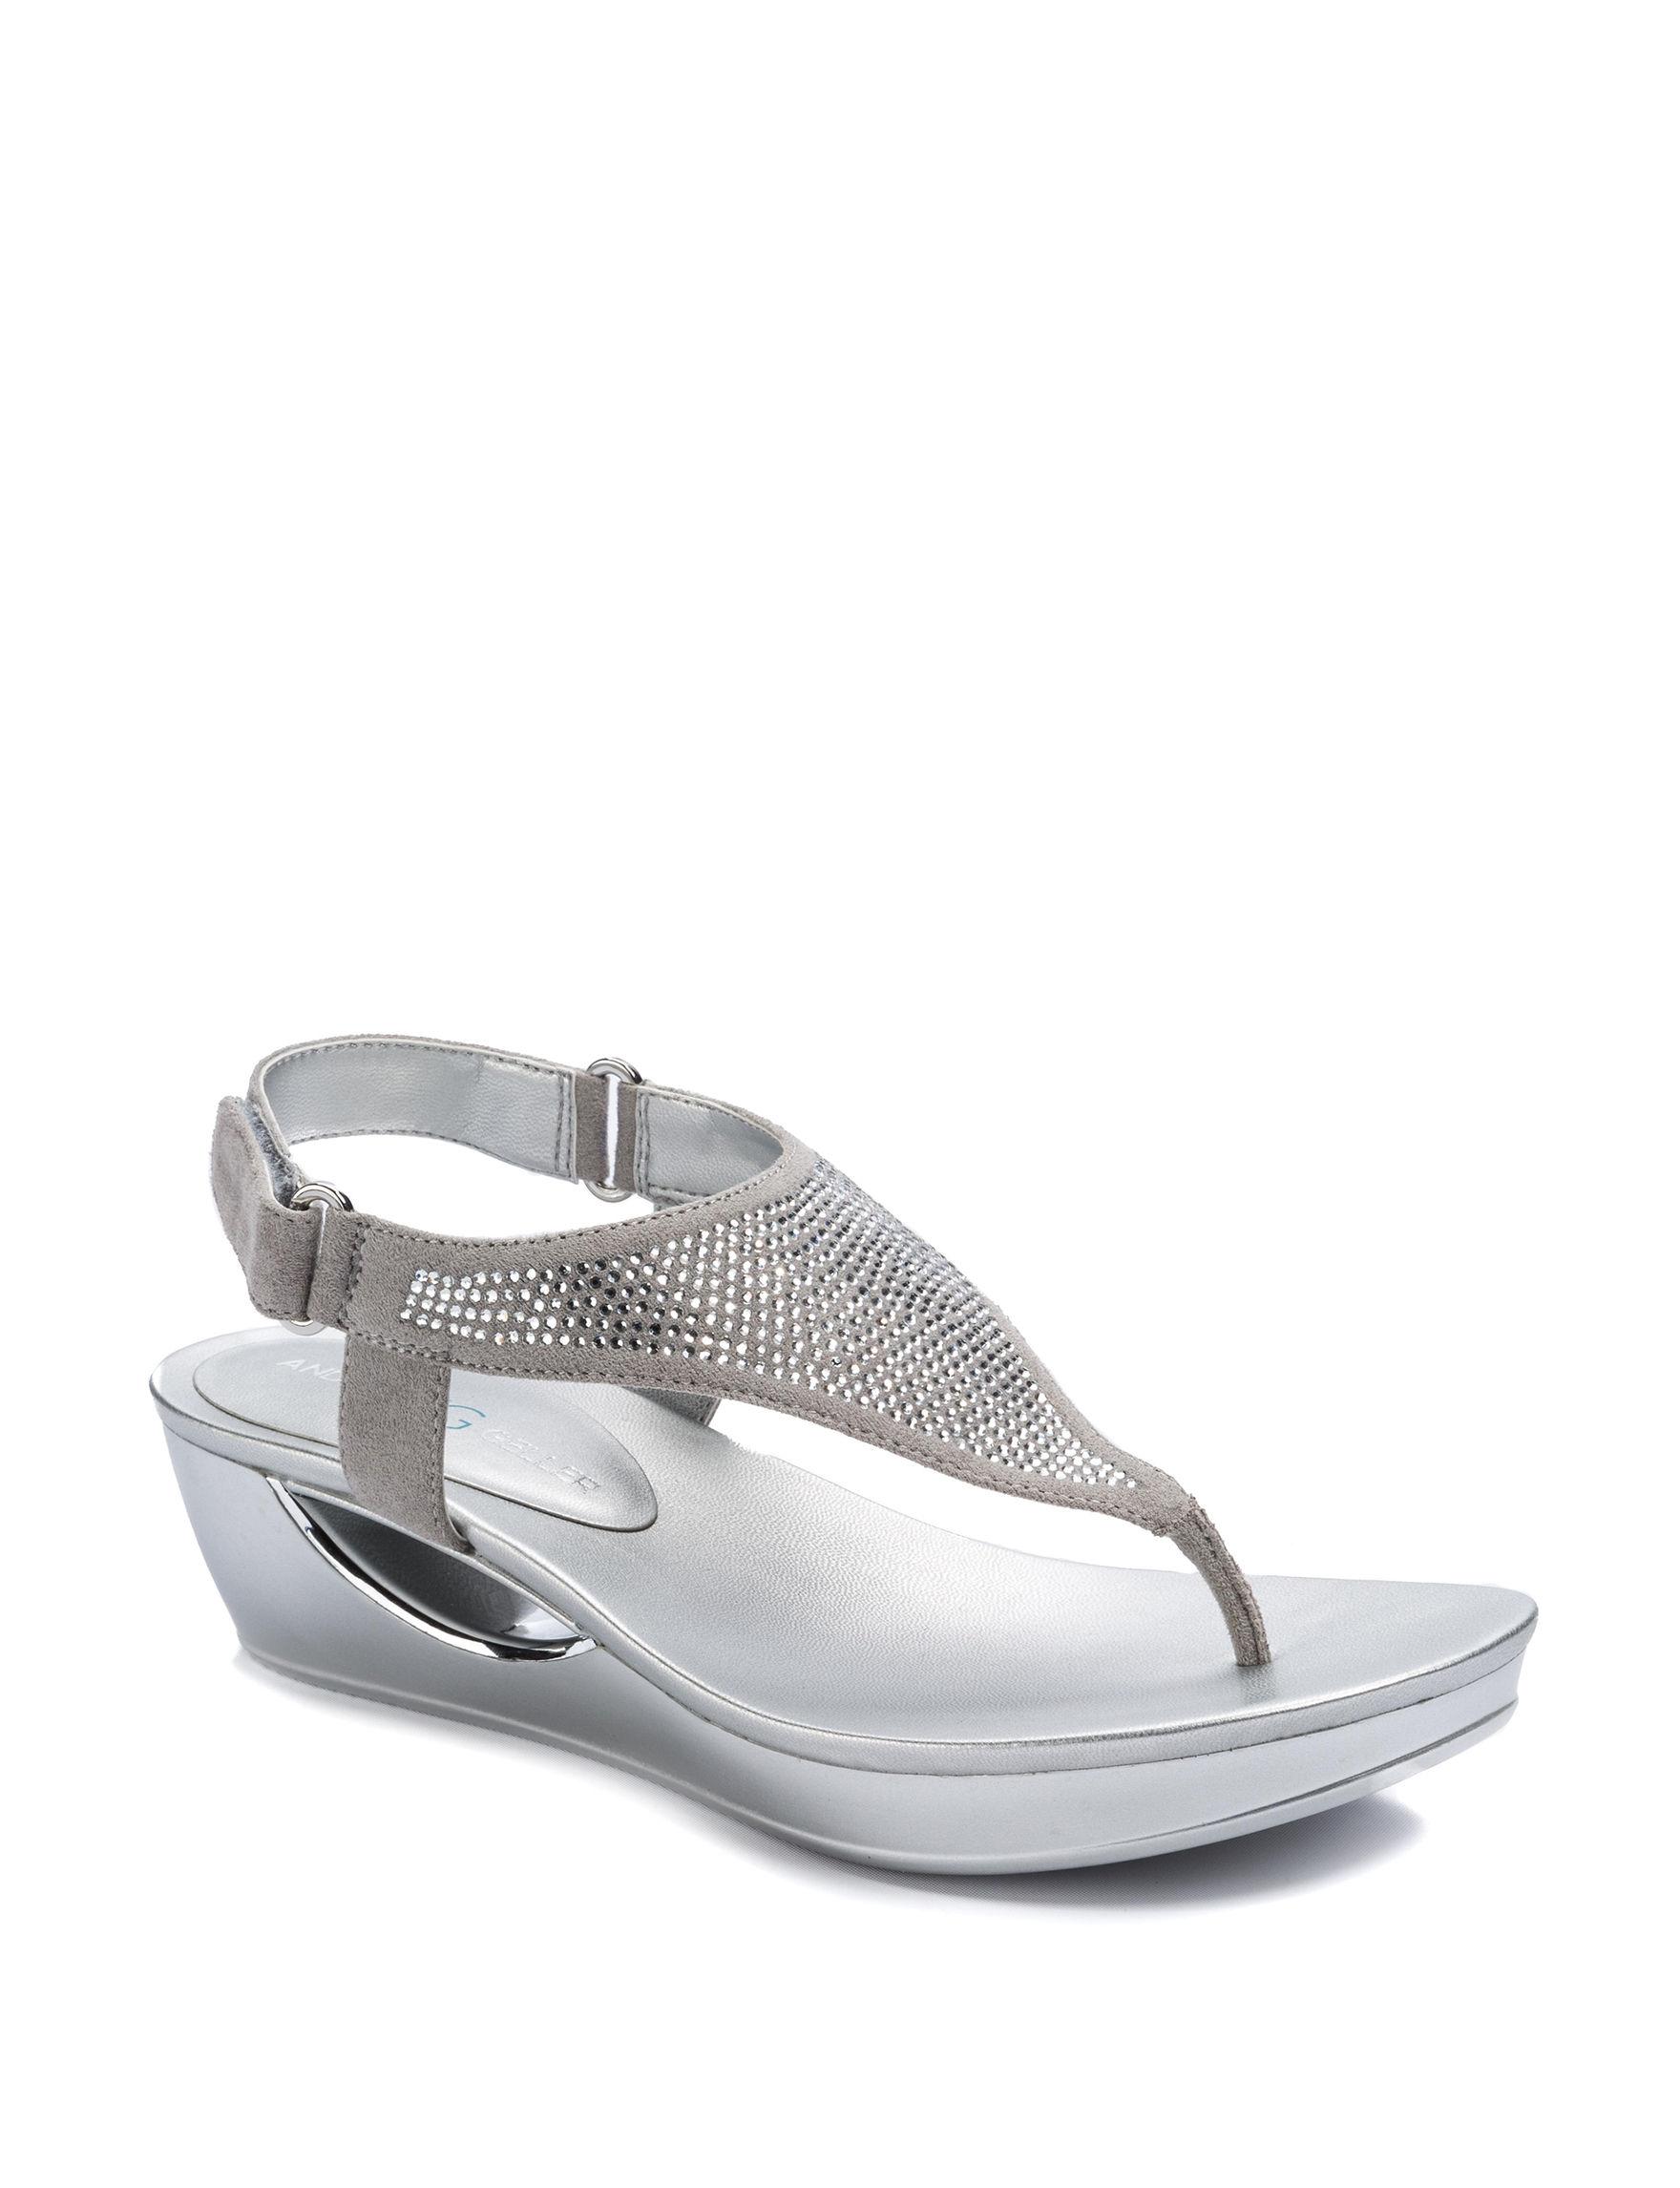 Andrew Geller Silver Wedge Sandals